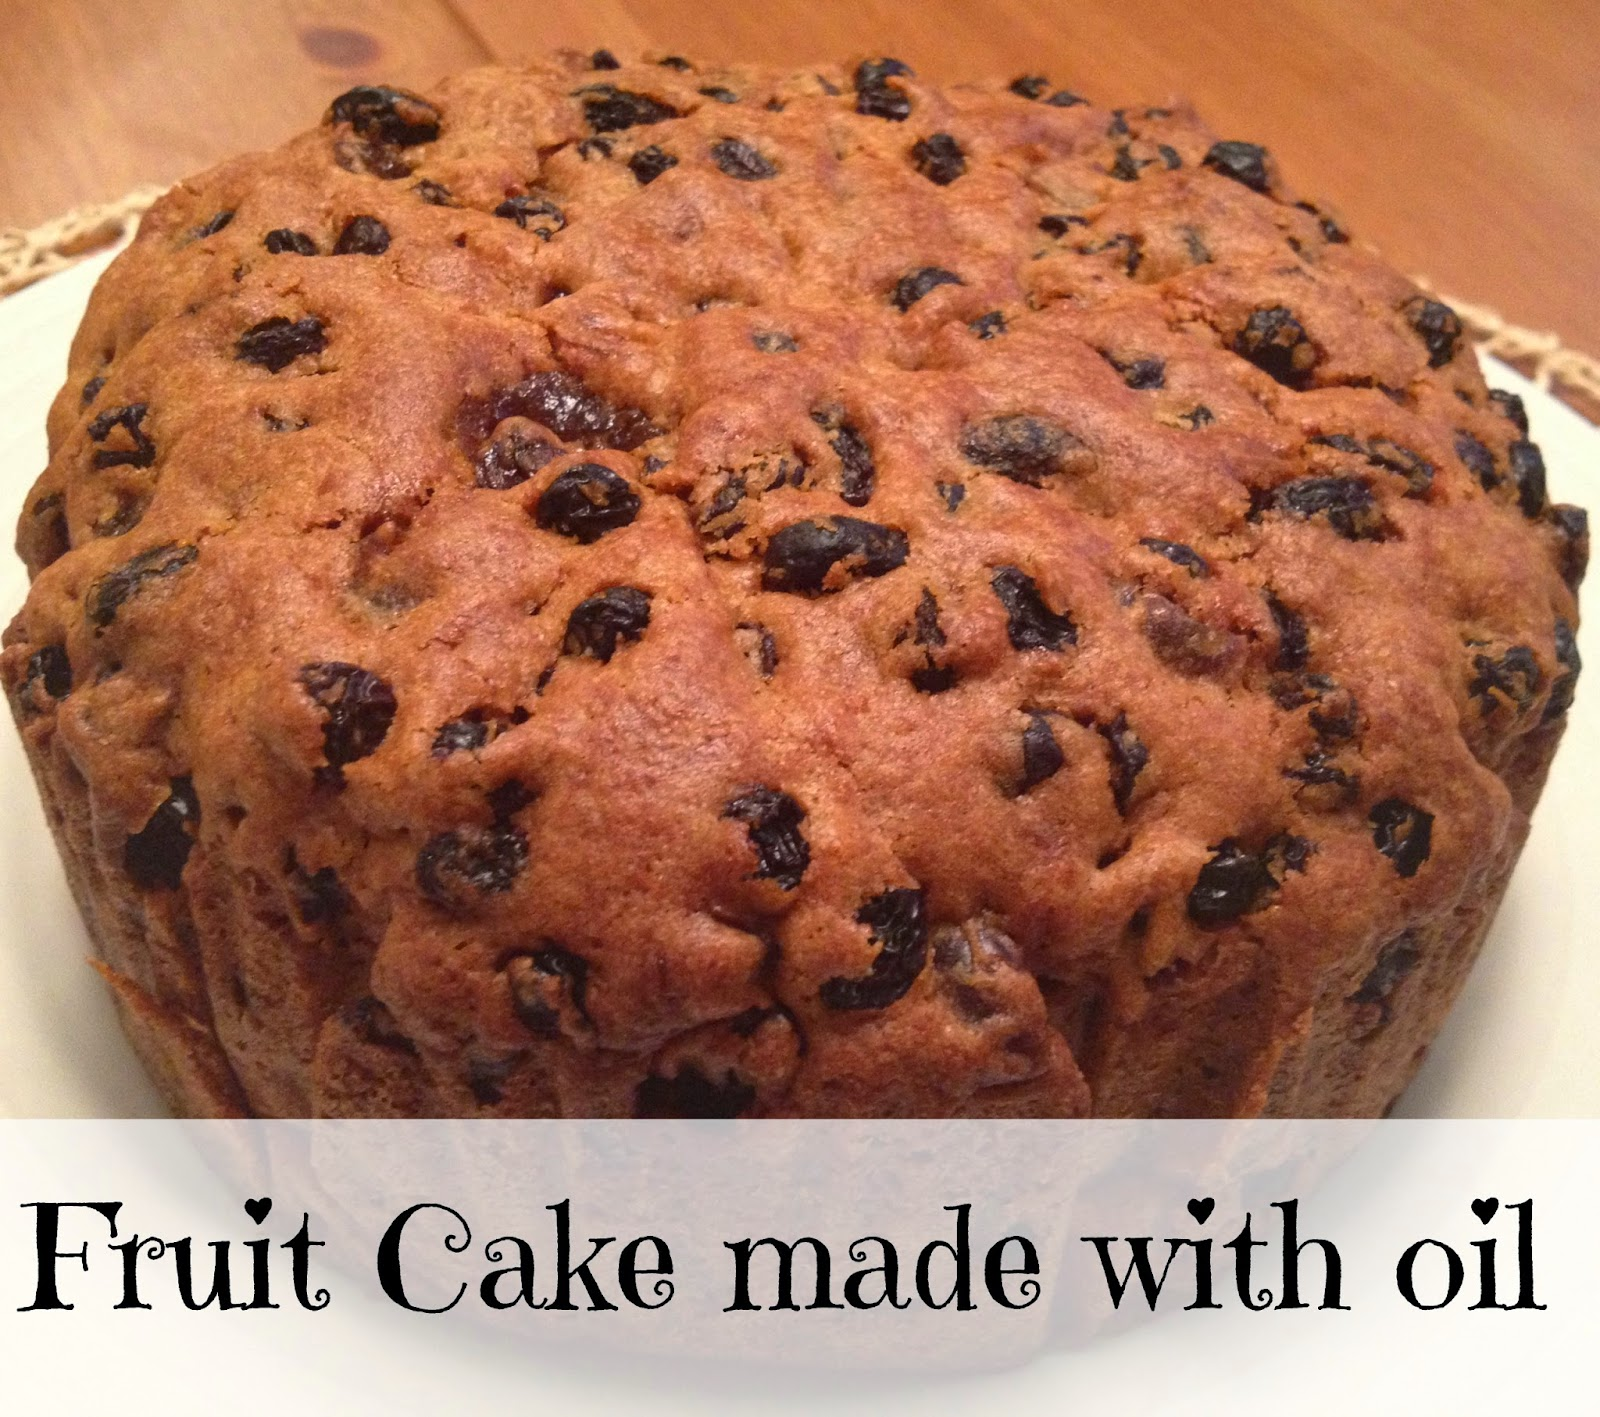 Can I Bake A Cake Using Canola Oil